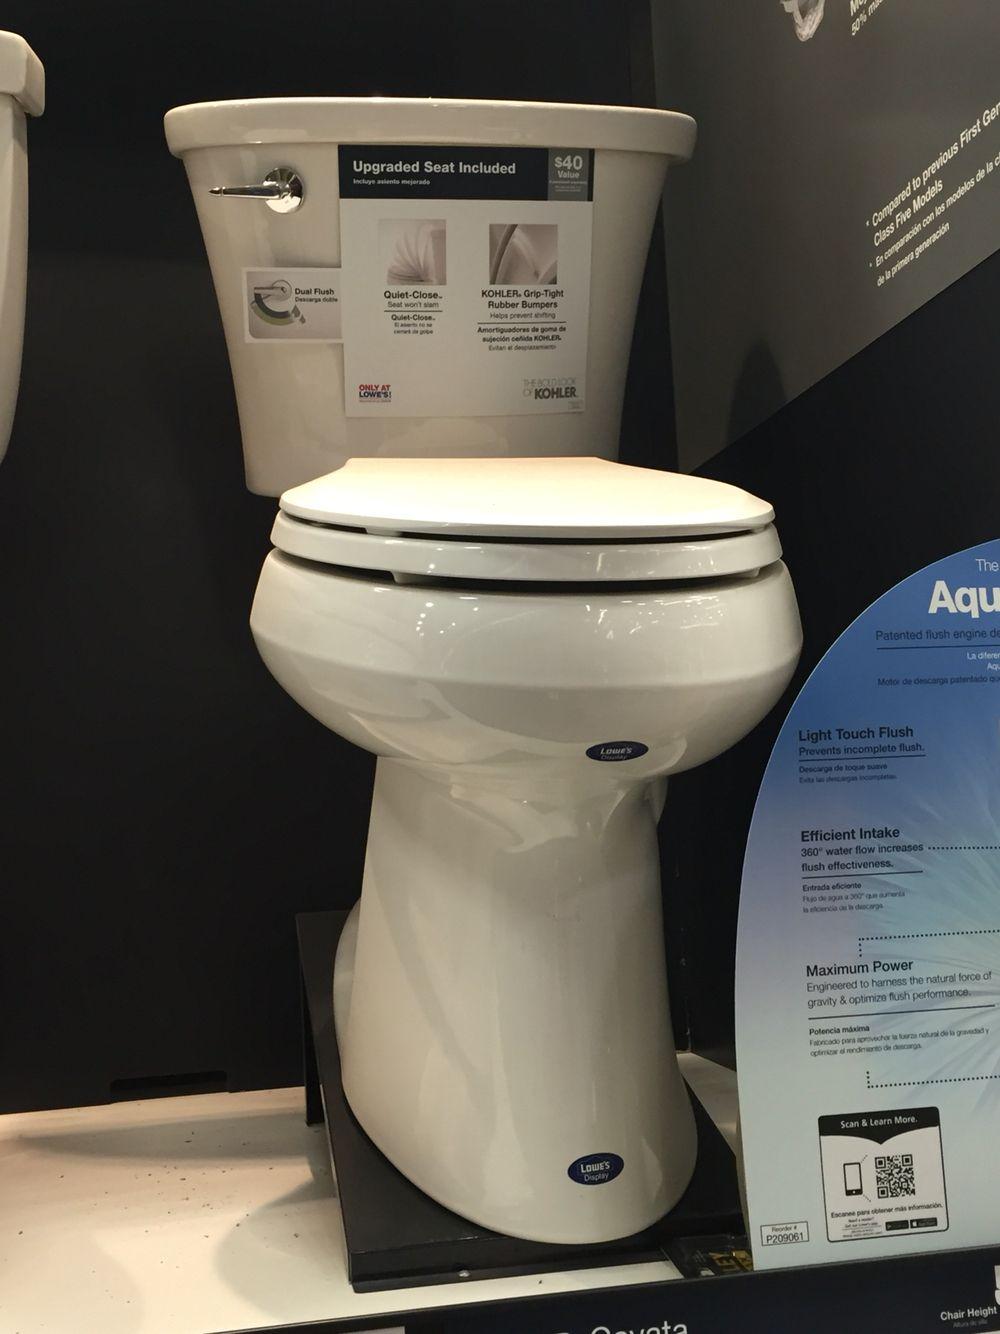 Outstanding Lowes Kohler Cavata New Bathroom Bathroom Toilet Beatyapartments Chair Design Images Beatyapartmentscom